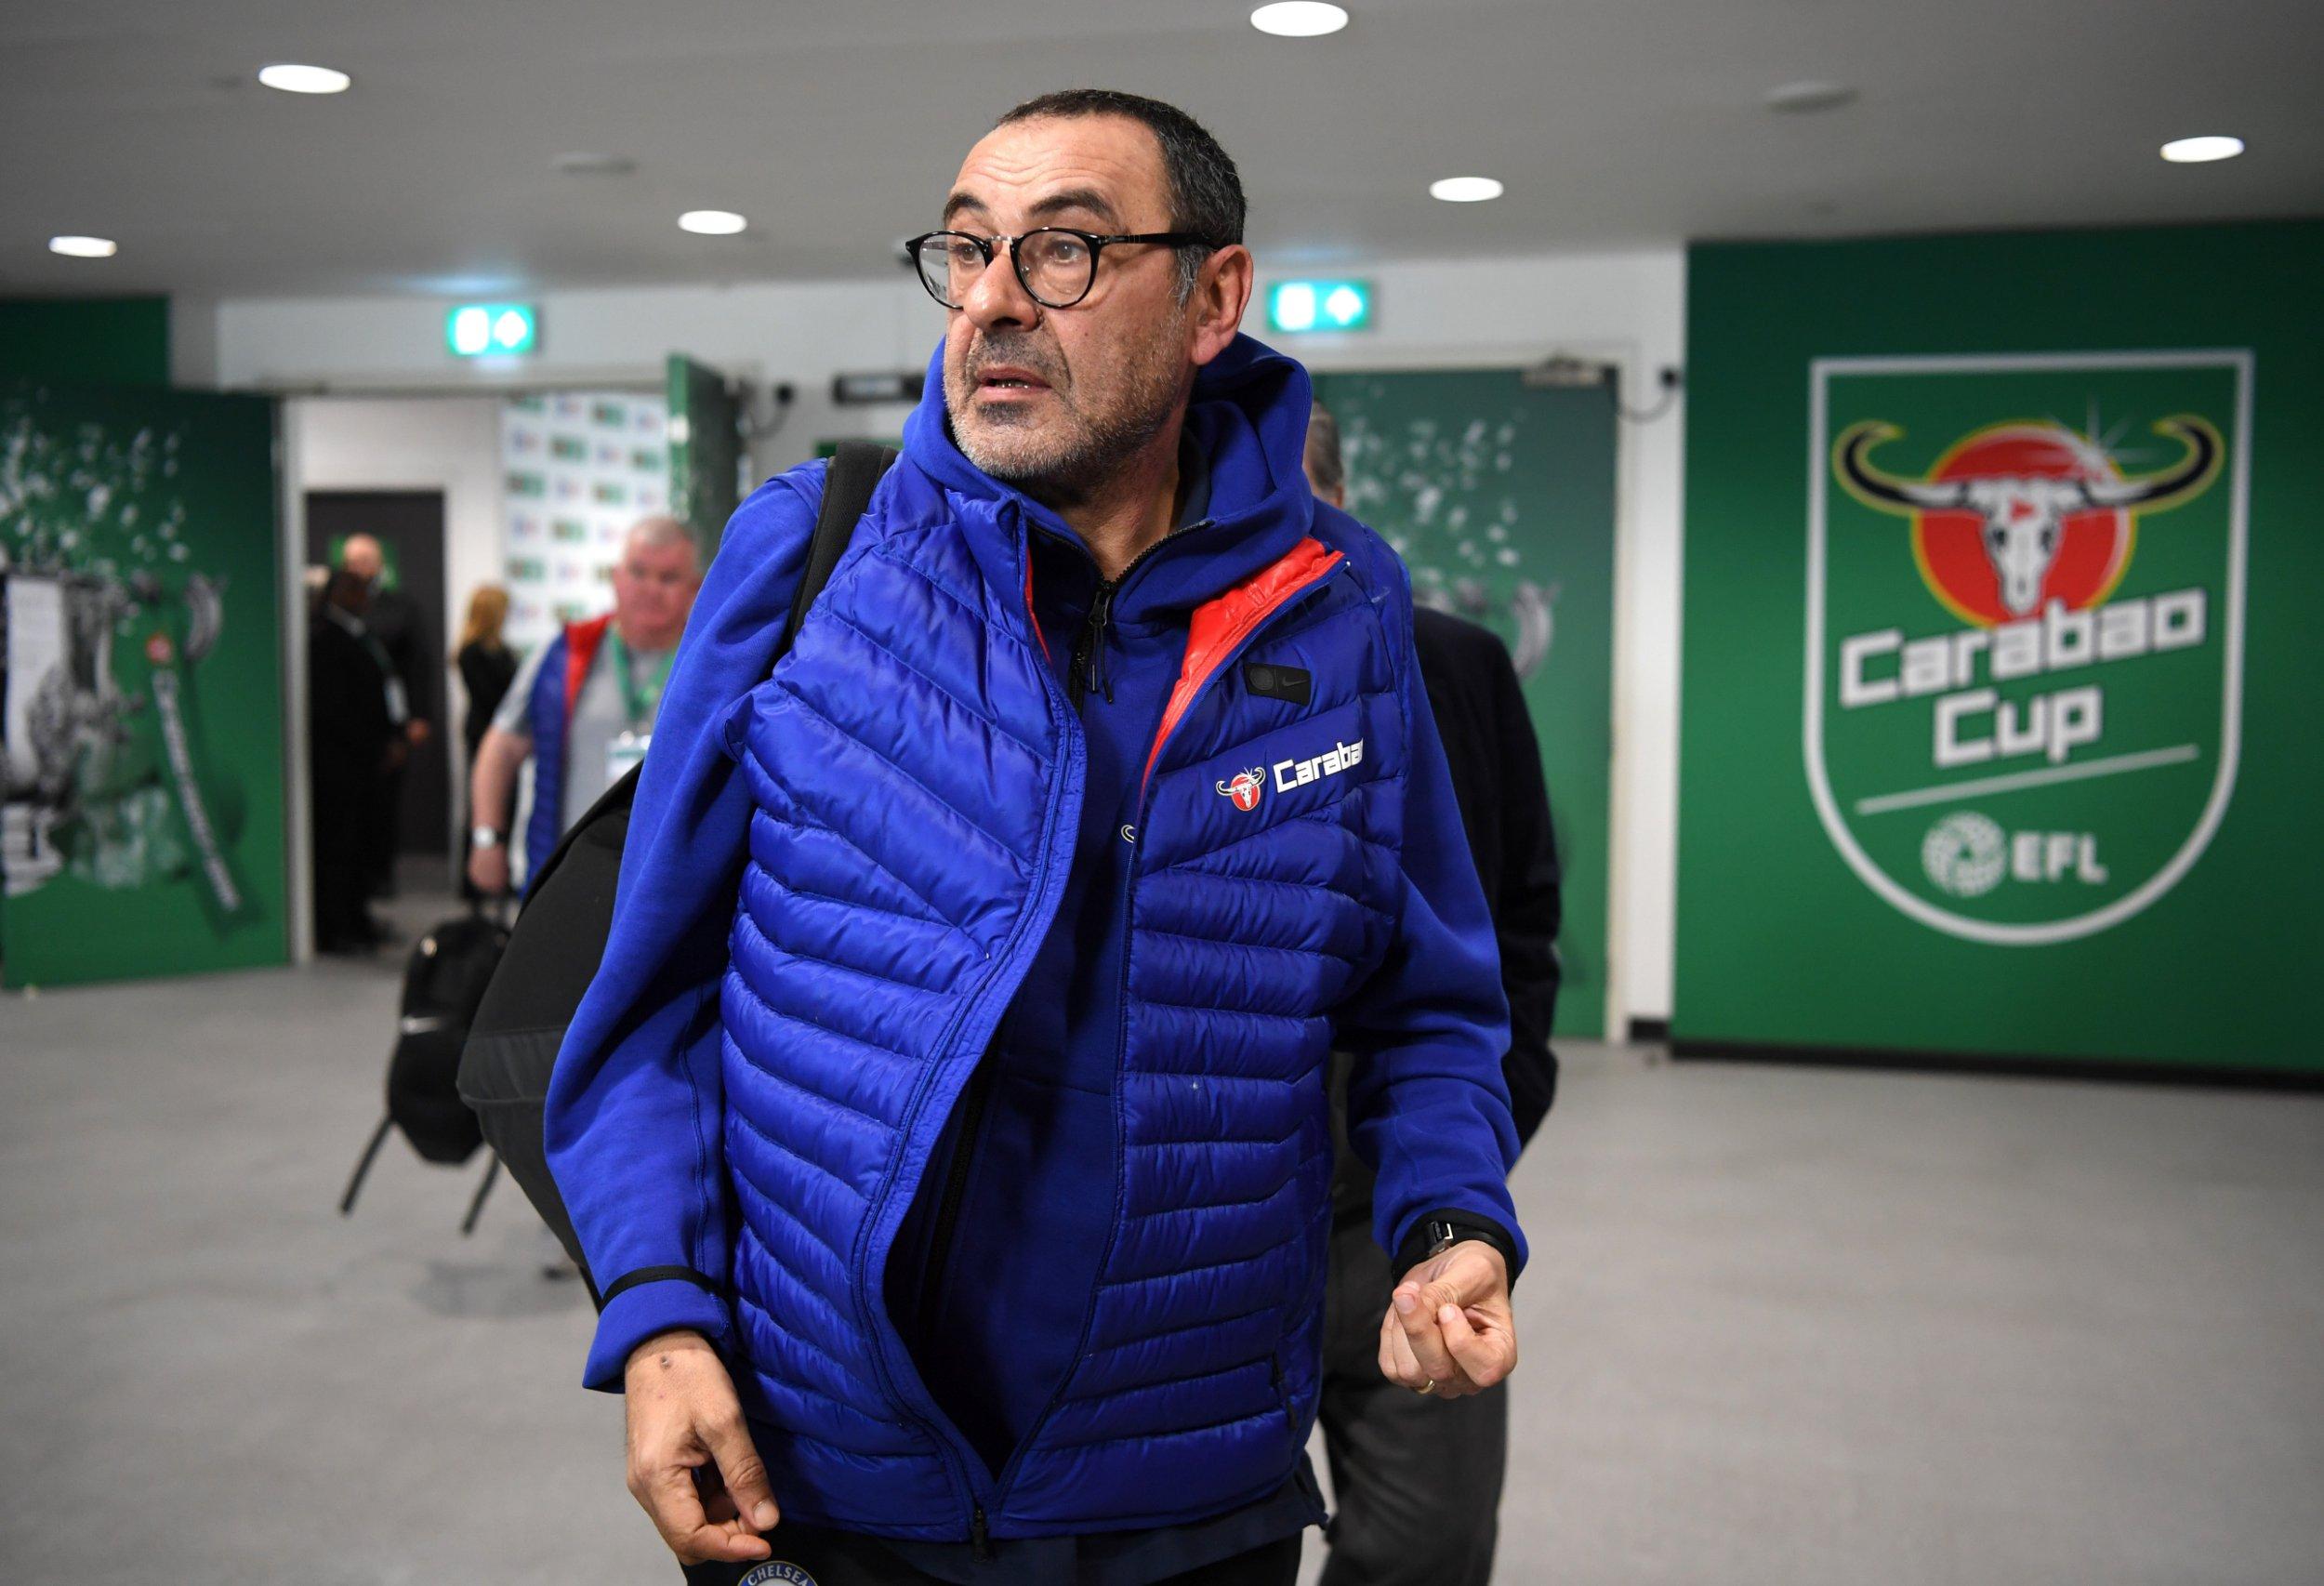 Kepa Arrizabalaga substitution row will cost Maurizio Sarri his job at Chelsea, says Alan Shearer